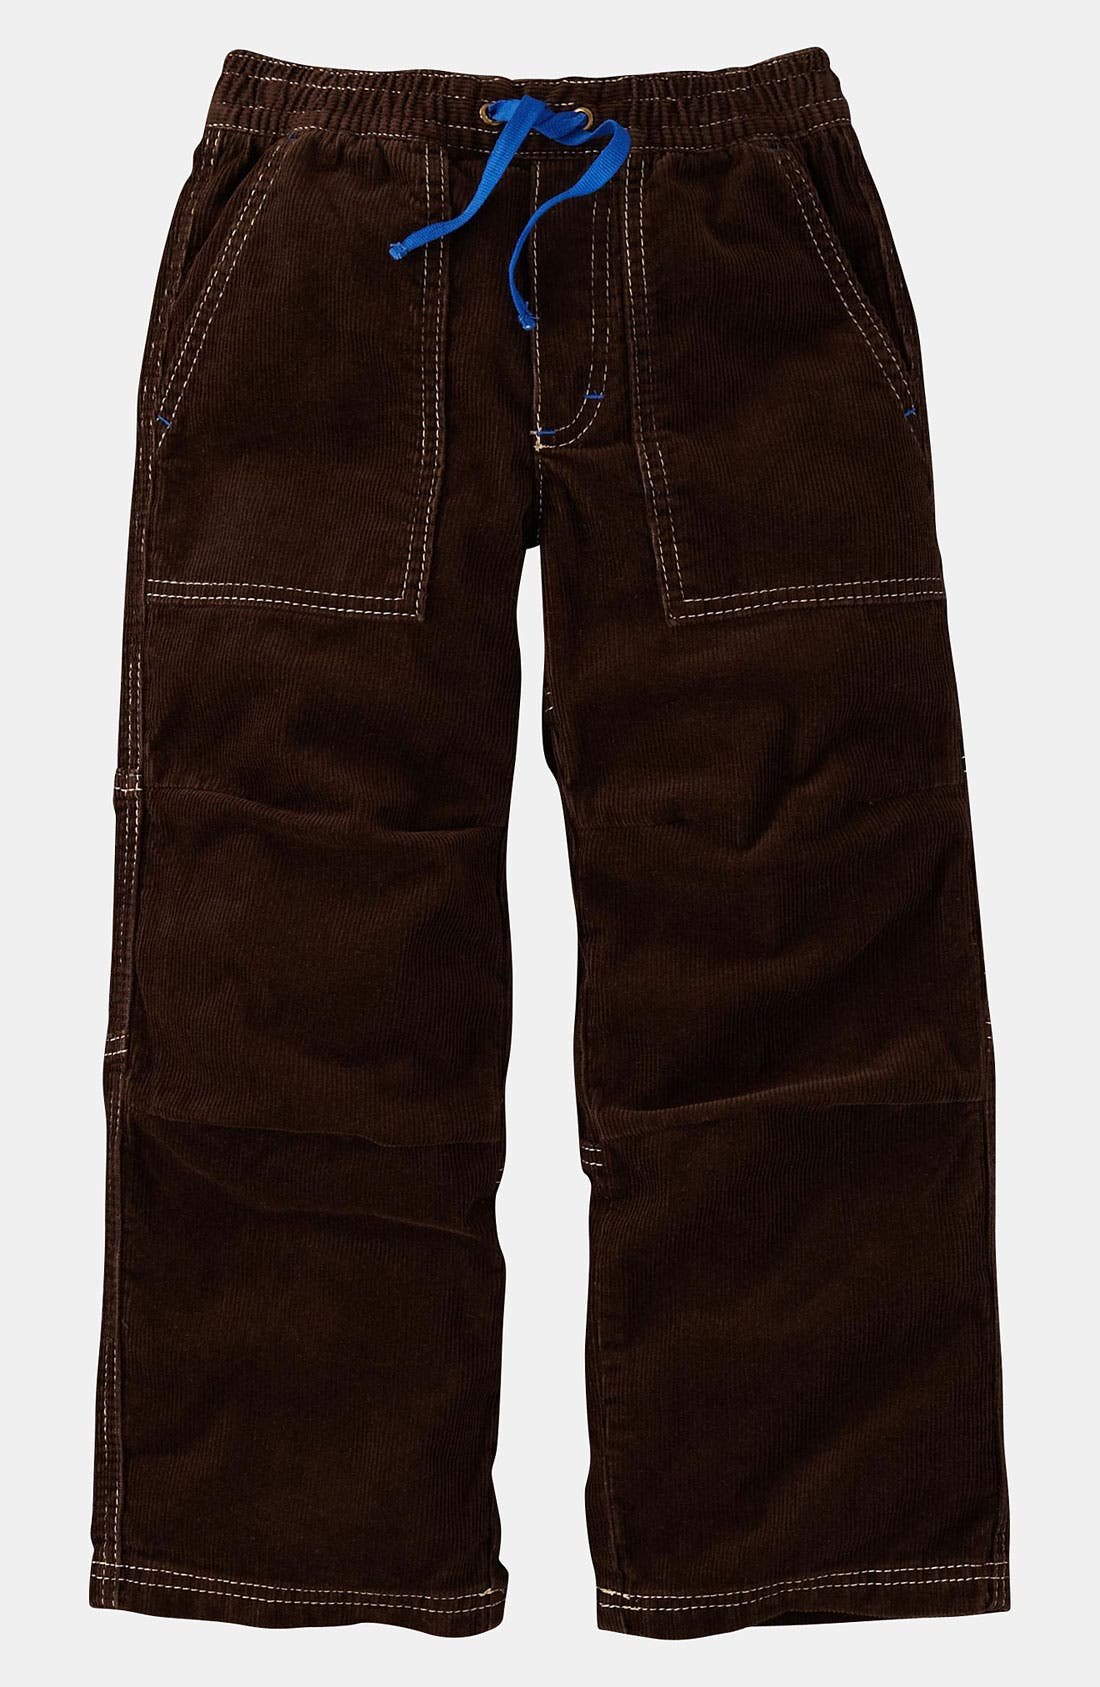 Alternate Image 1 Selected - Mini Boden Corduroy Pants (Toddler)